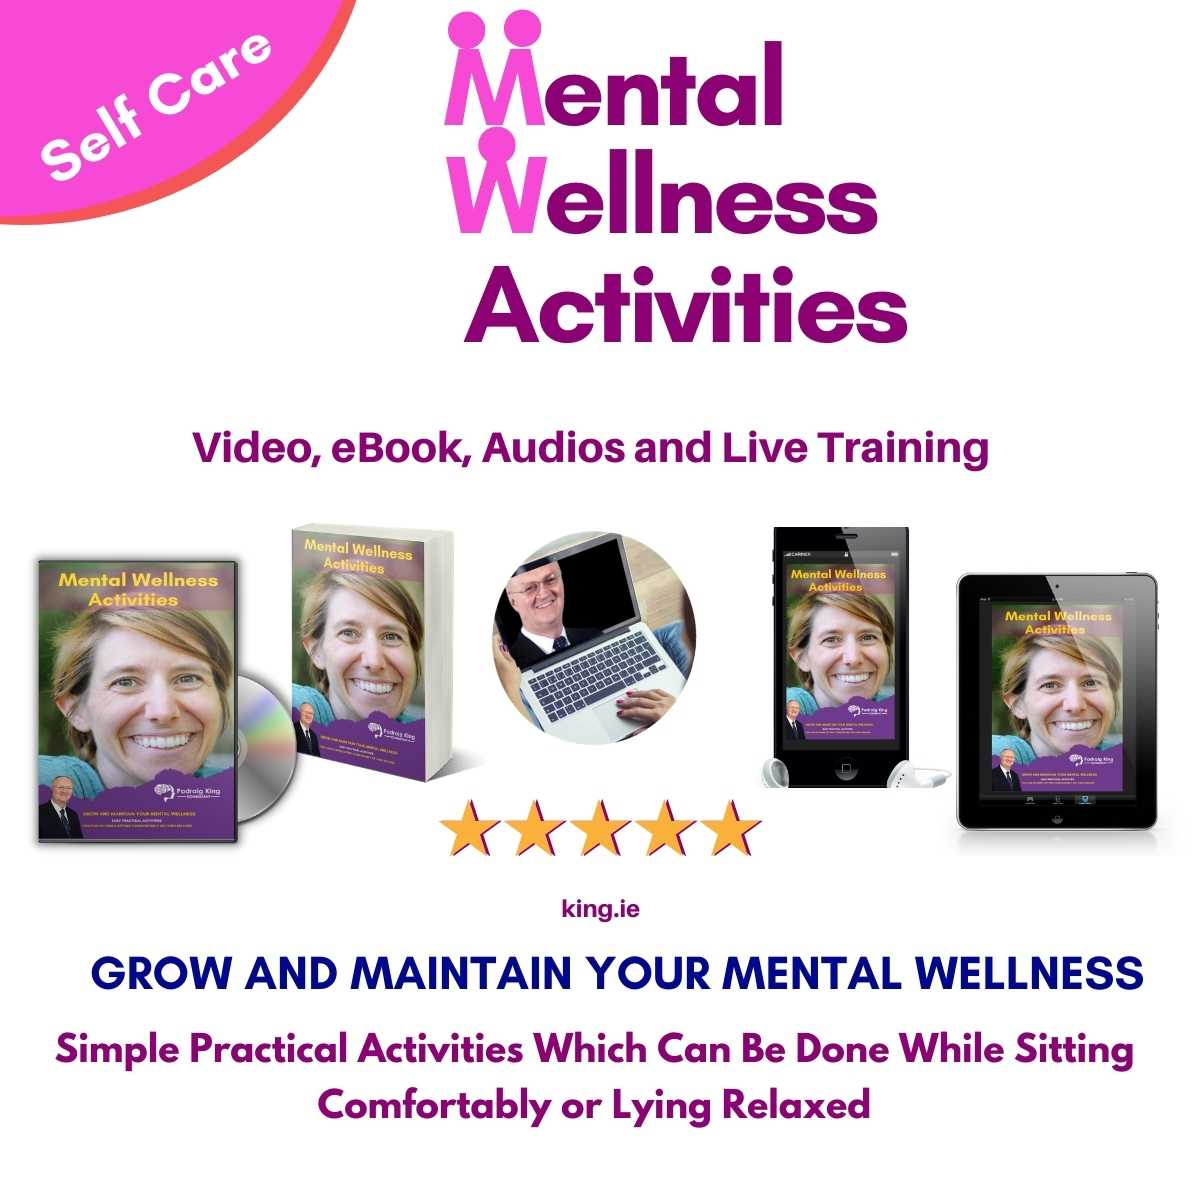 Self-Care Mental Wellness Activities Video Program by Padraig King king.ie/loveme